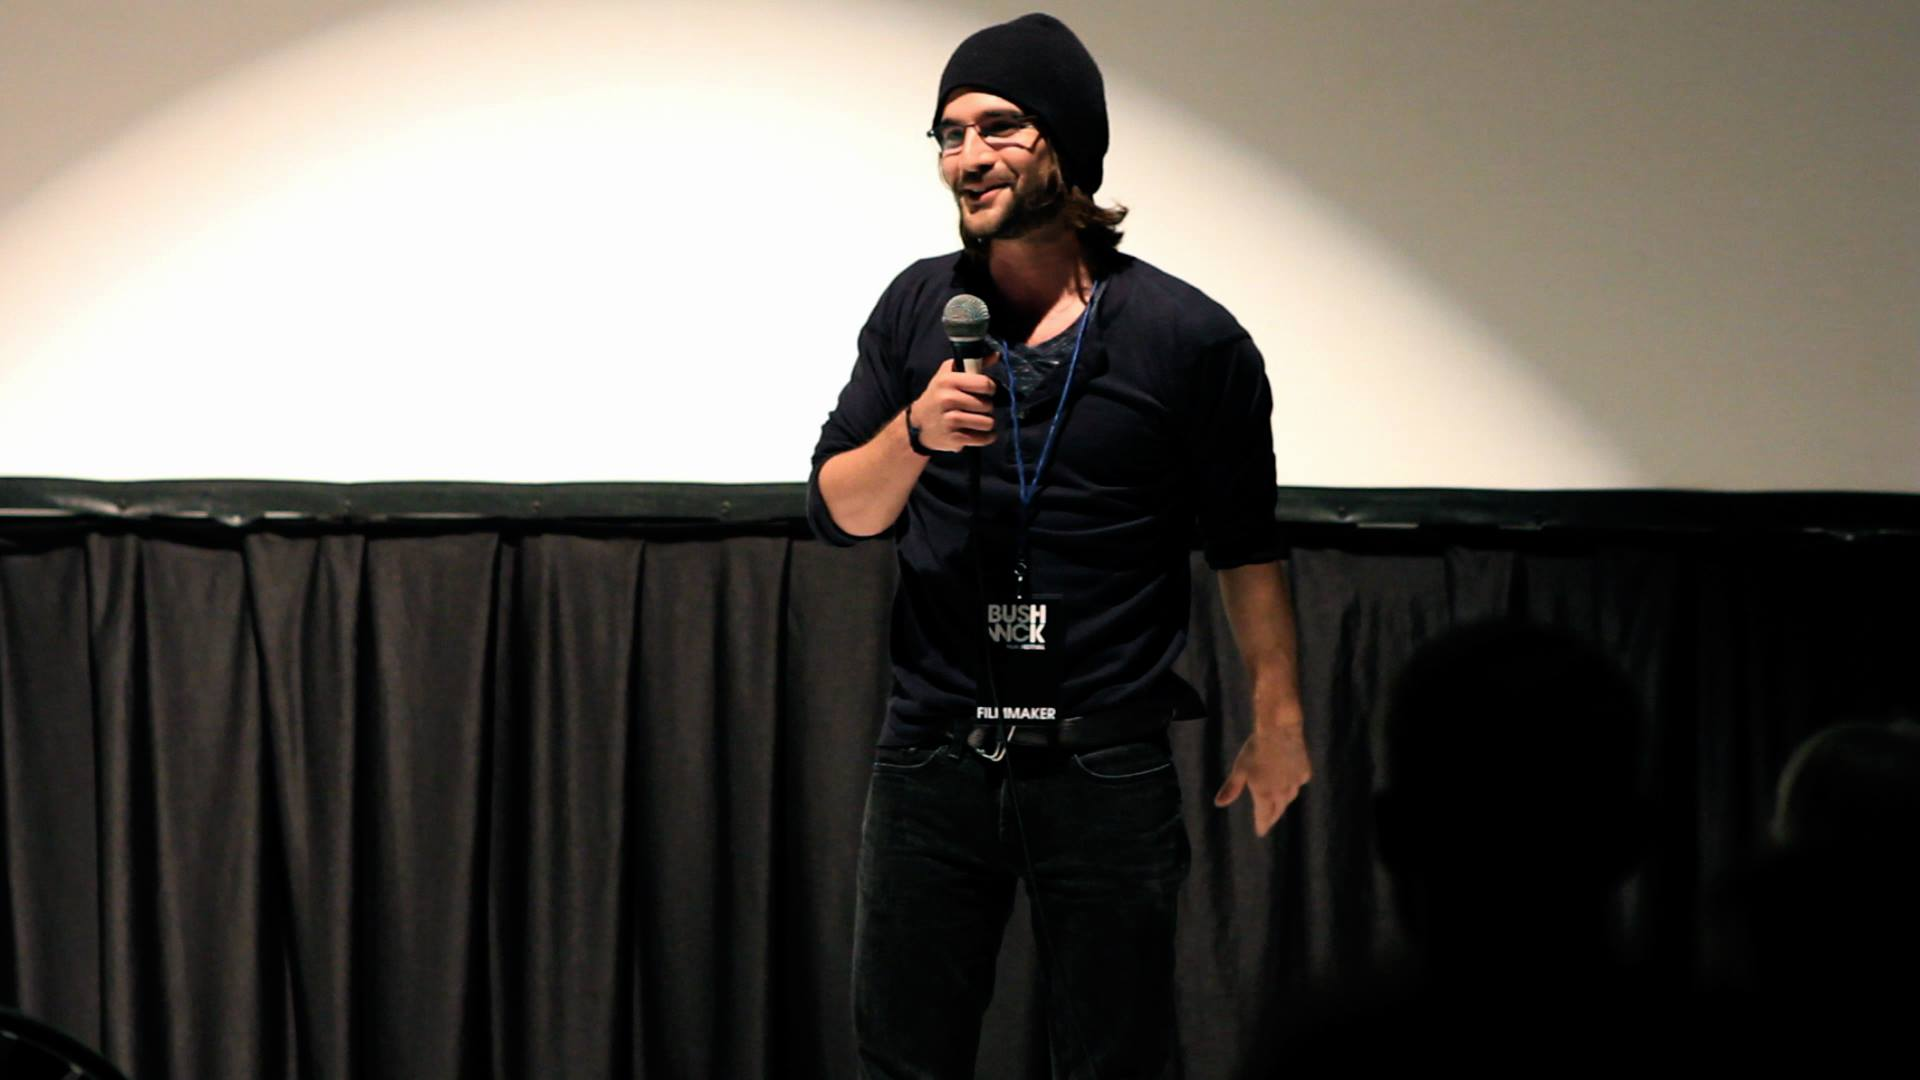 Writer/Director of 'Roxie' speaking on opening night of Bushwick International Film Festival.